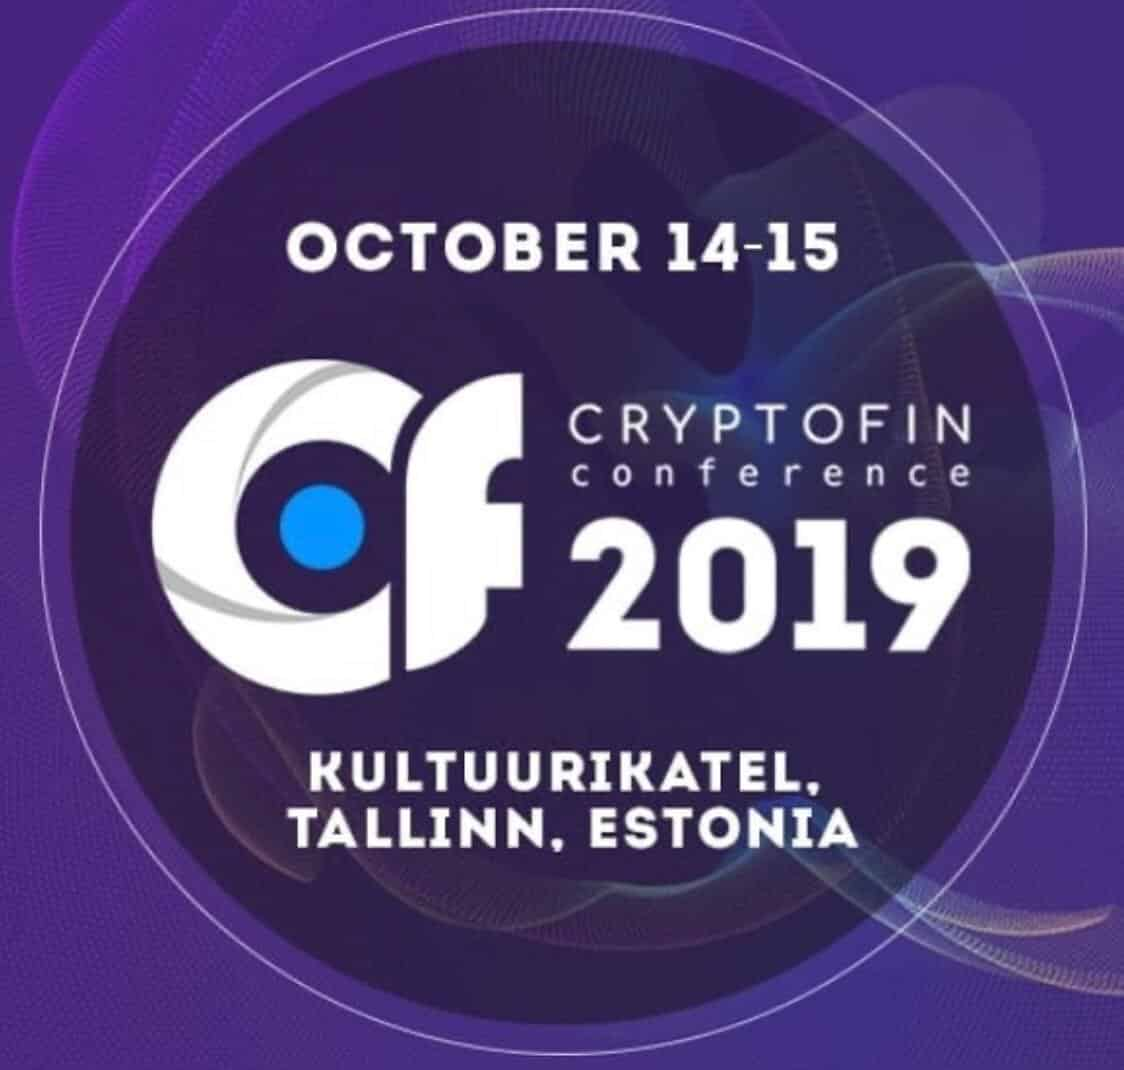 Cryptofin-Conference-2019